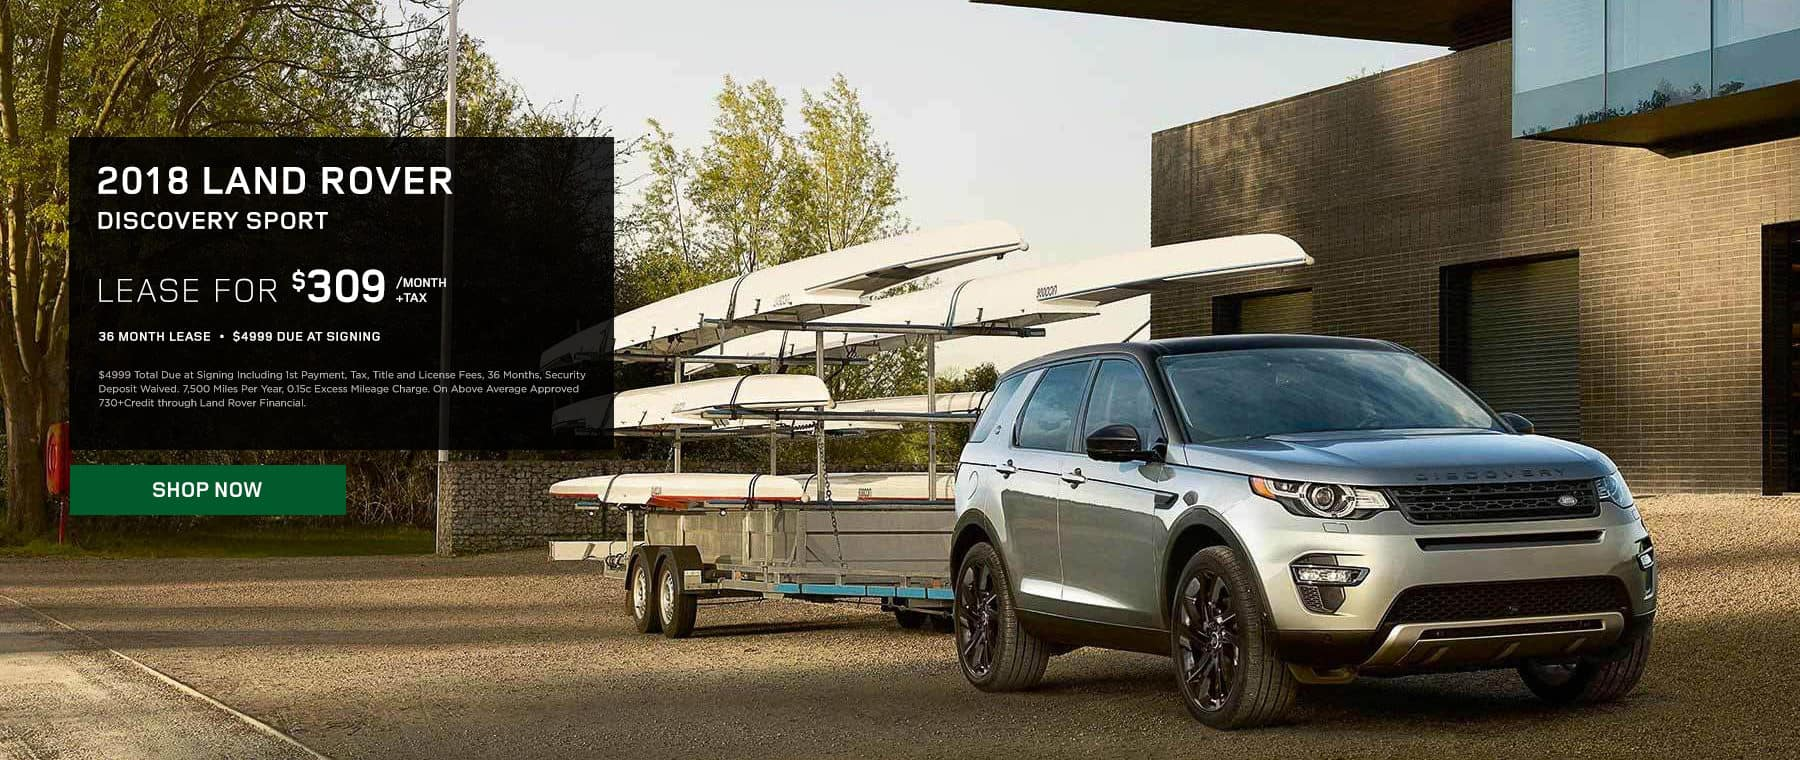 Land Rover Newport Beach | New & Used Cars Newport Beach, CA